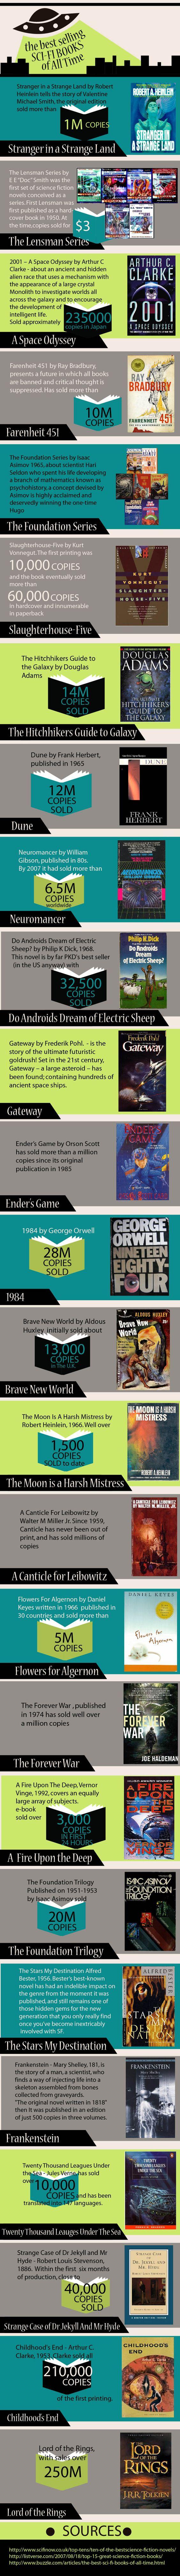 Superventas de libros de Ciencia-Ficción   The Best Selling Sci-fi Books of All Time